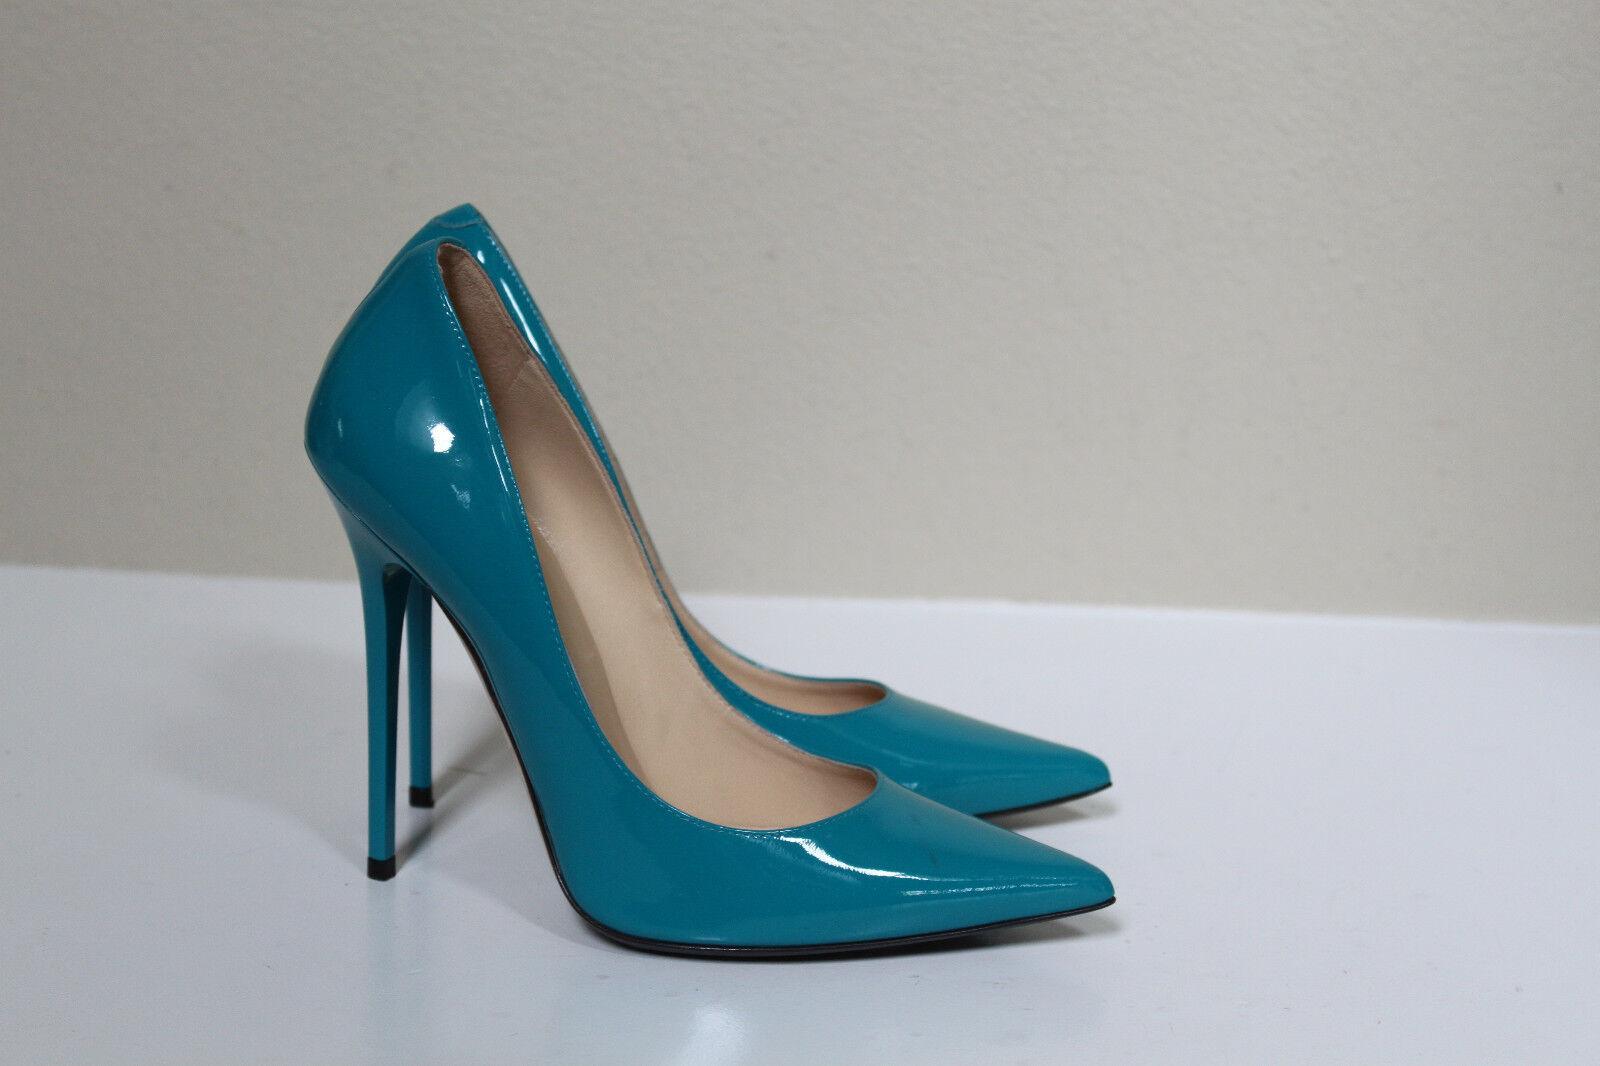 Sz 7.5   37.5 Jimmy Choo Anouk Blau Aqua Patent Leather Point Toe Heel Pump schuhe